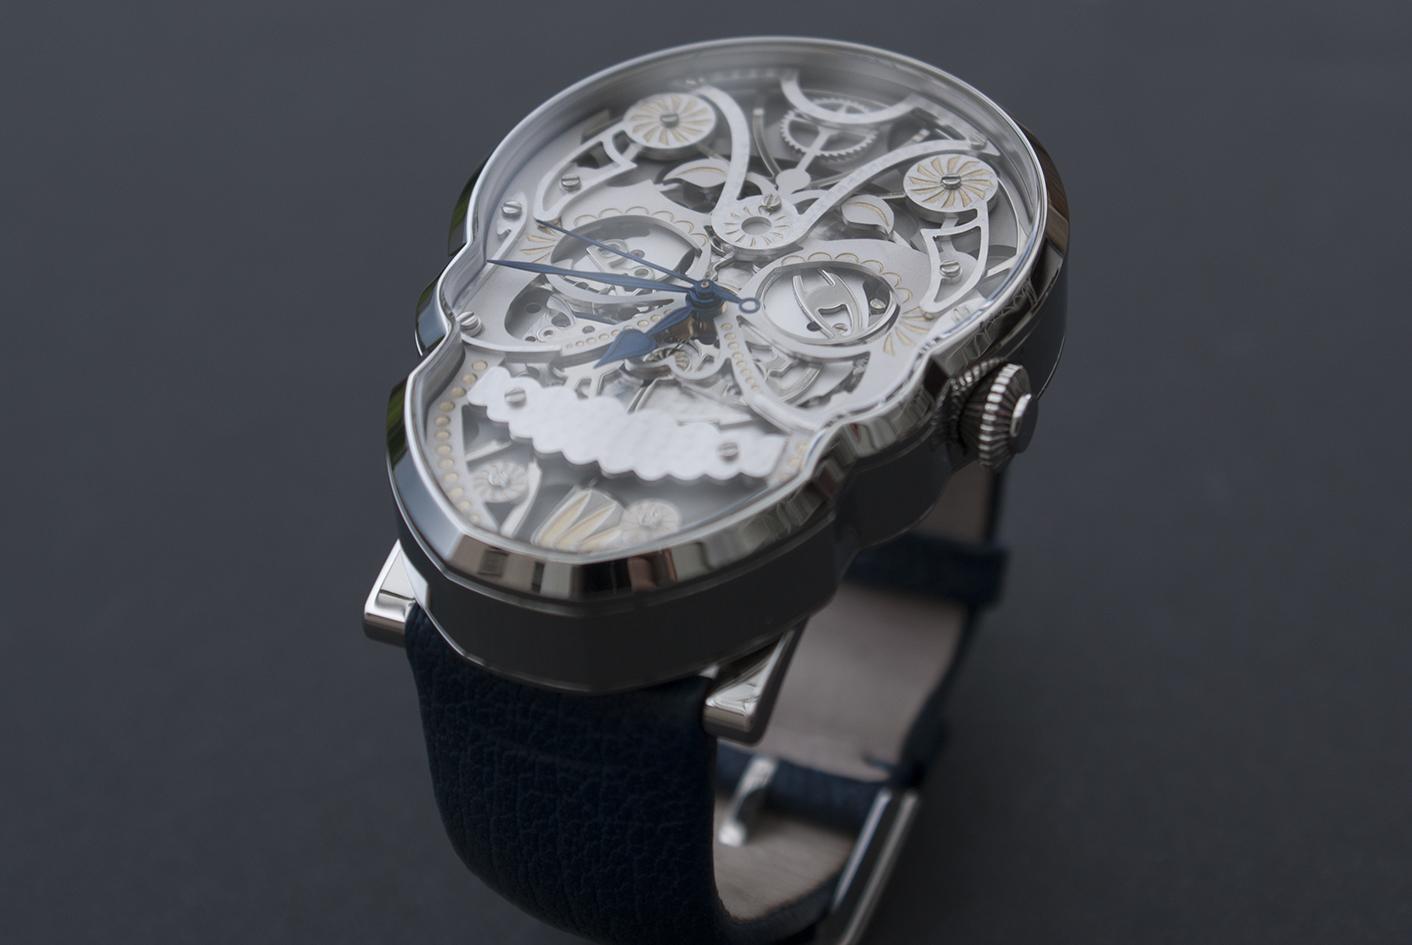 The Skull watch.